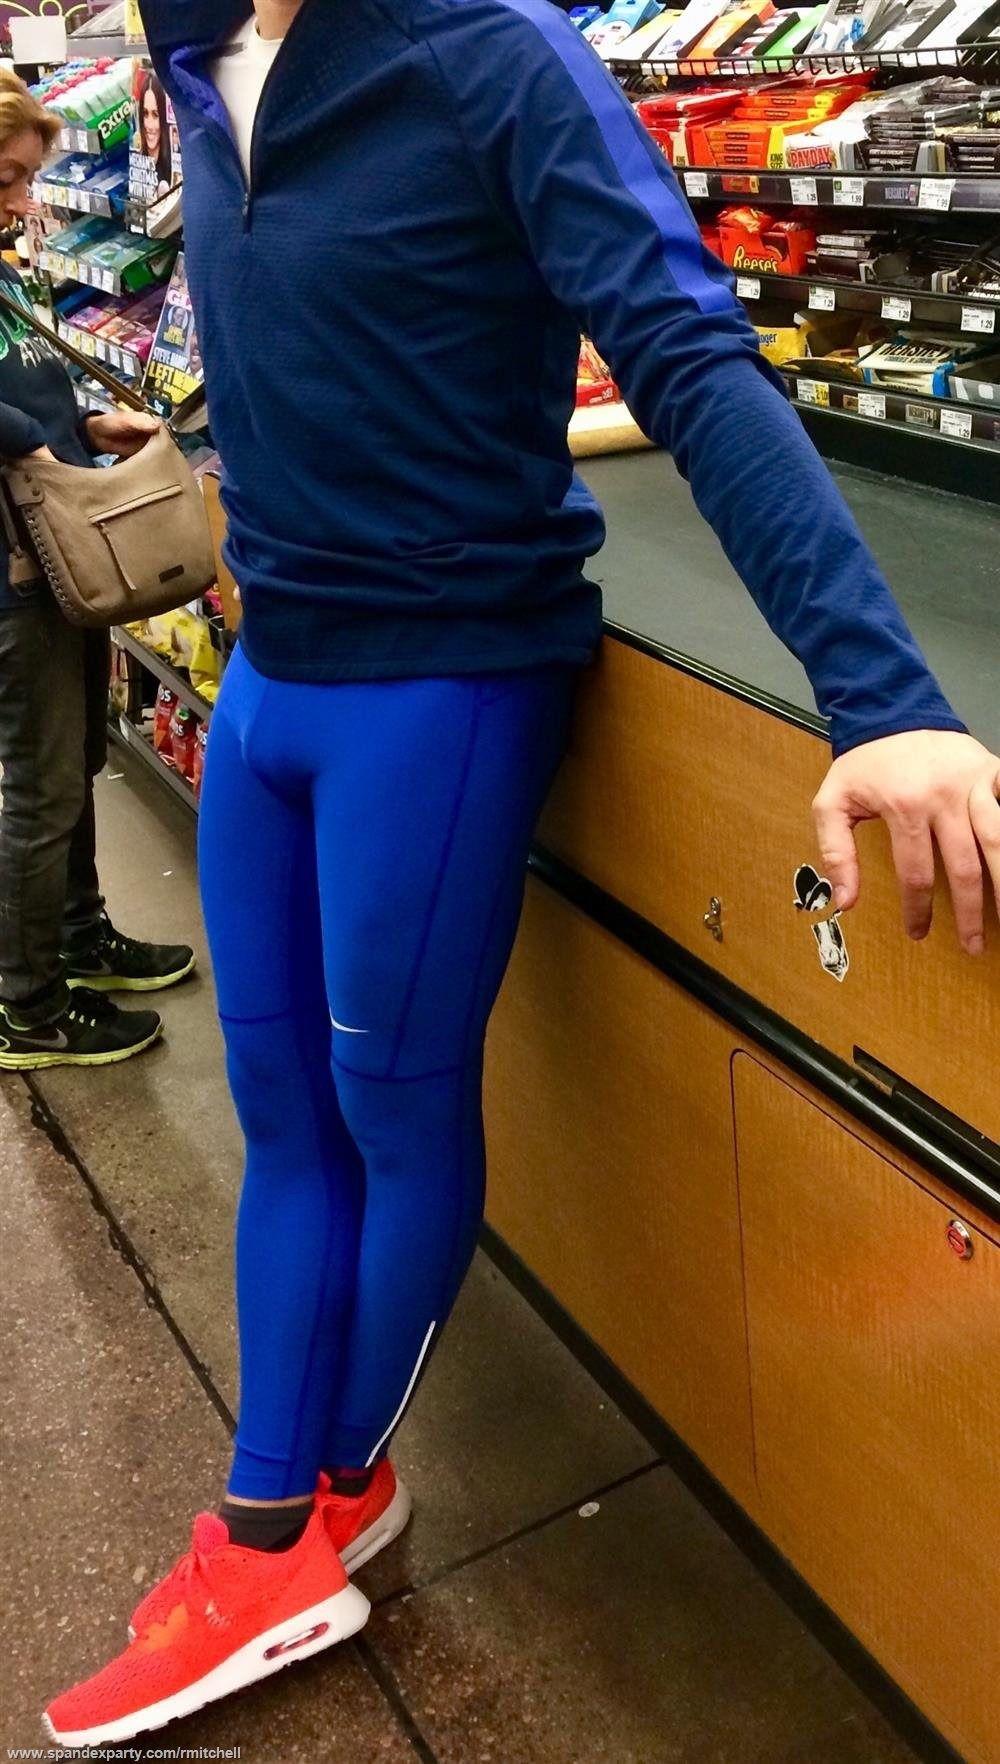 Hommes Gym Sports Super-héros Compression Leggings Pantalon Fitness Jogging T-shirts Costume